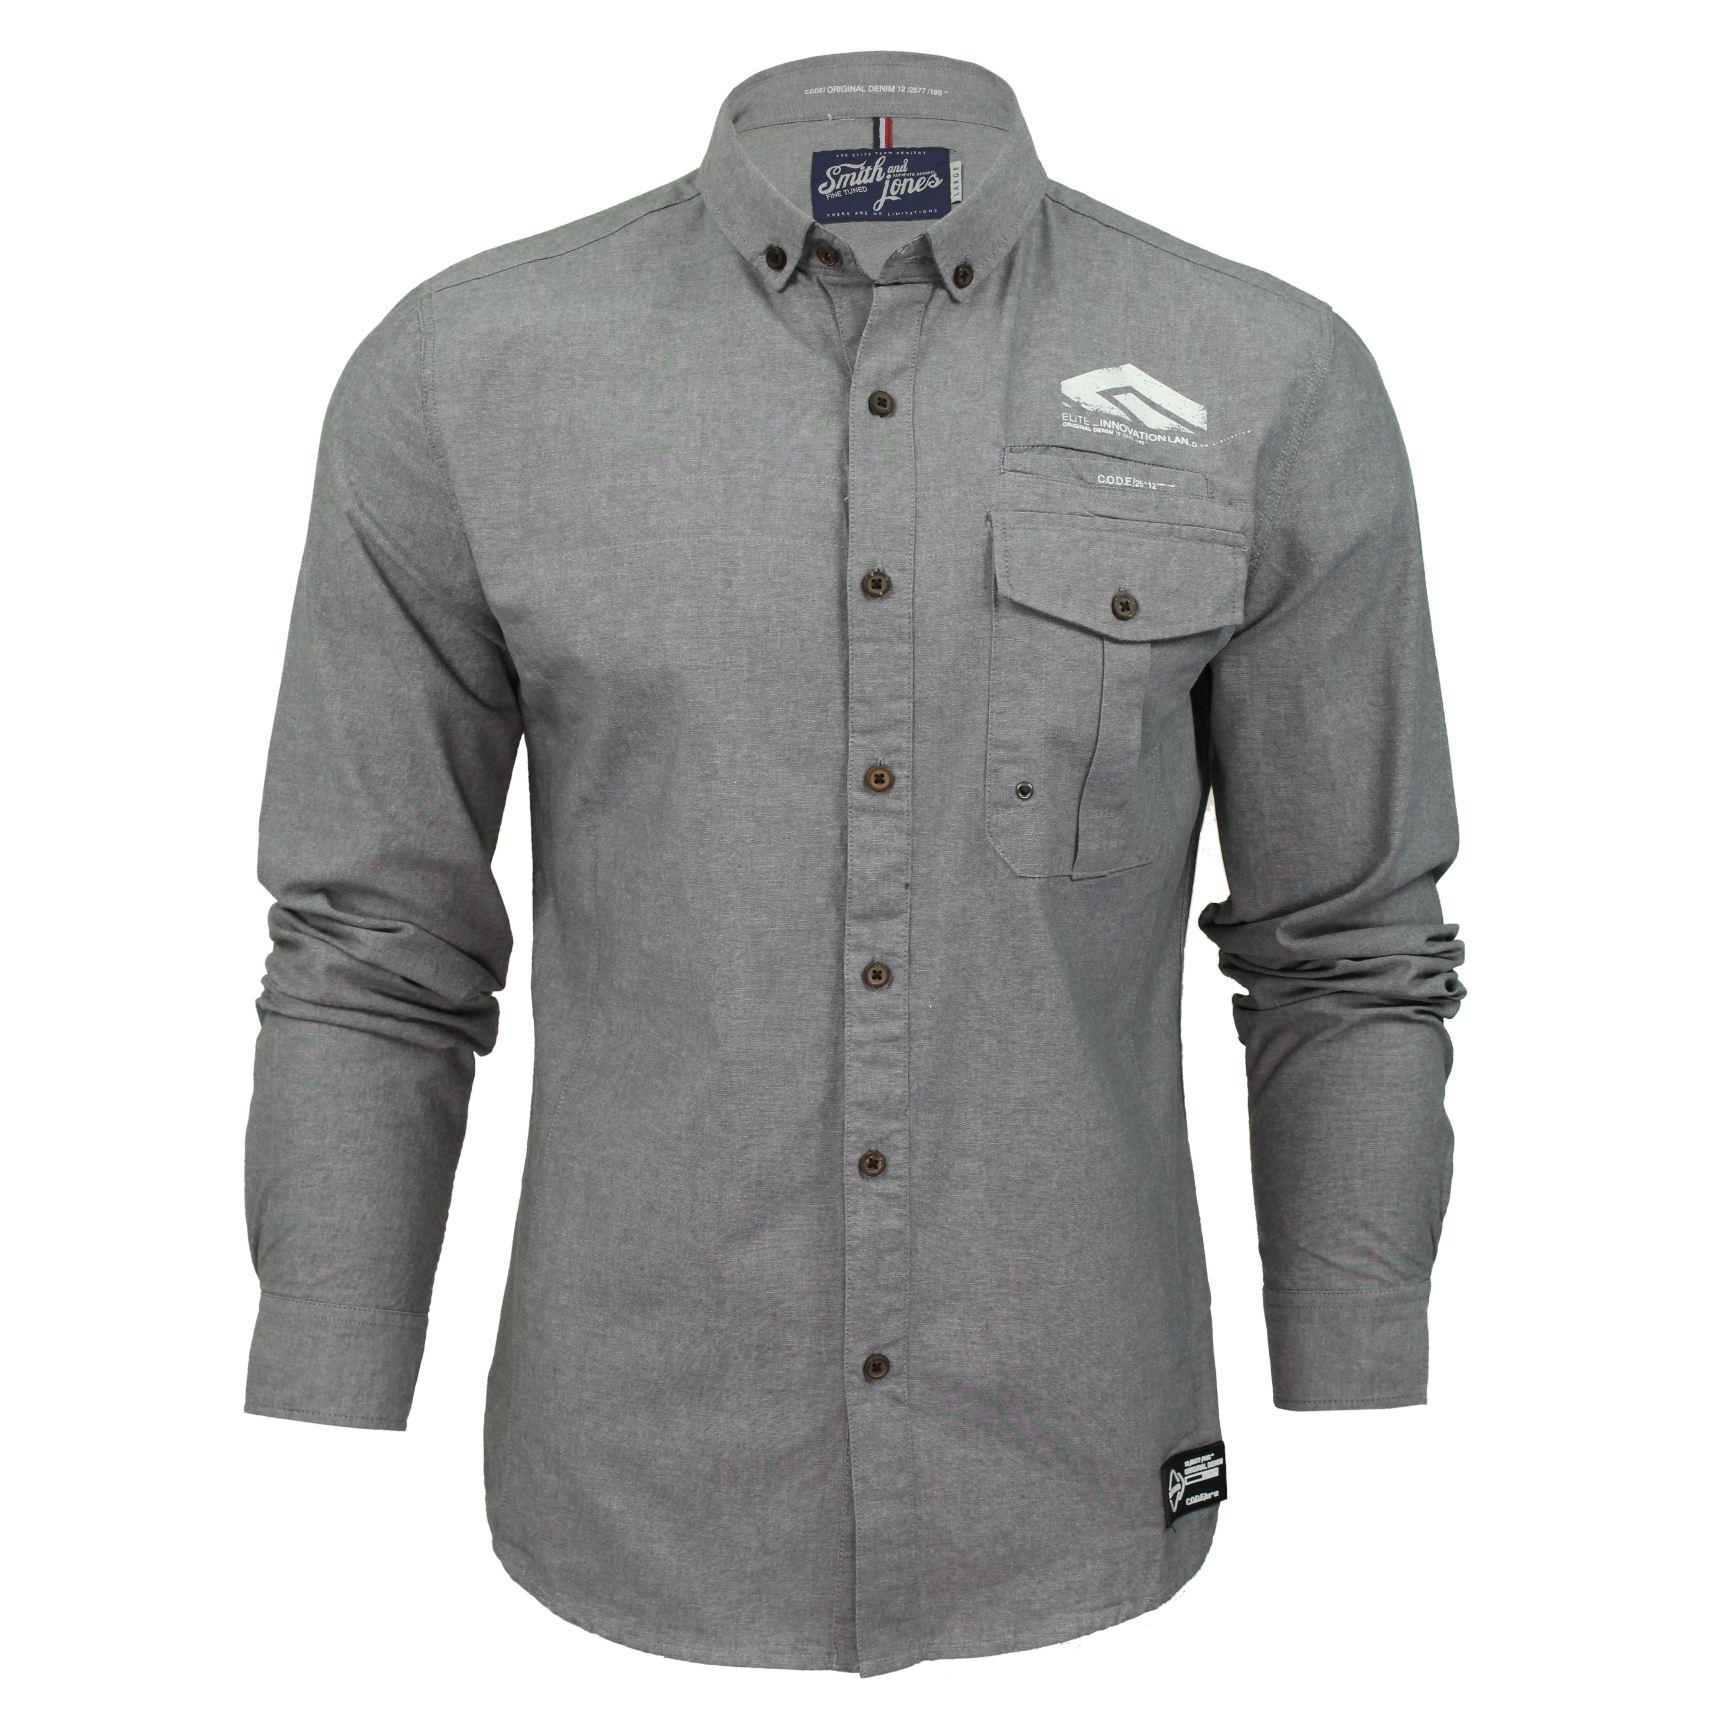 Mens shirt by smith jones 39 chadwick 39 long sleeved slim for Men s wedding dress shirts